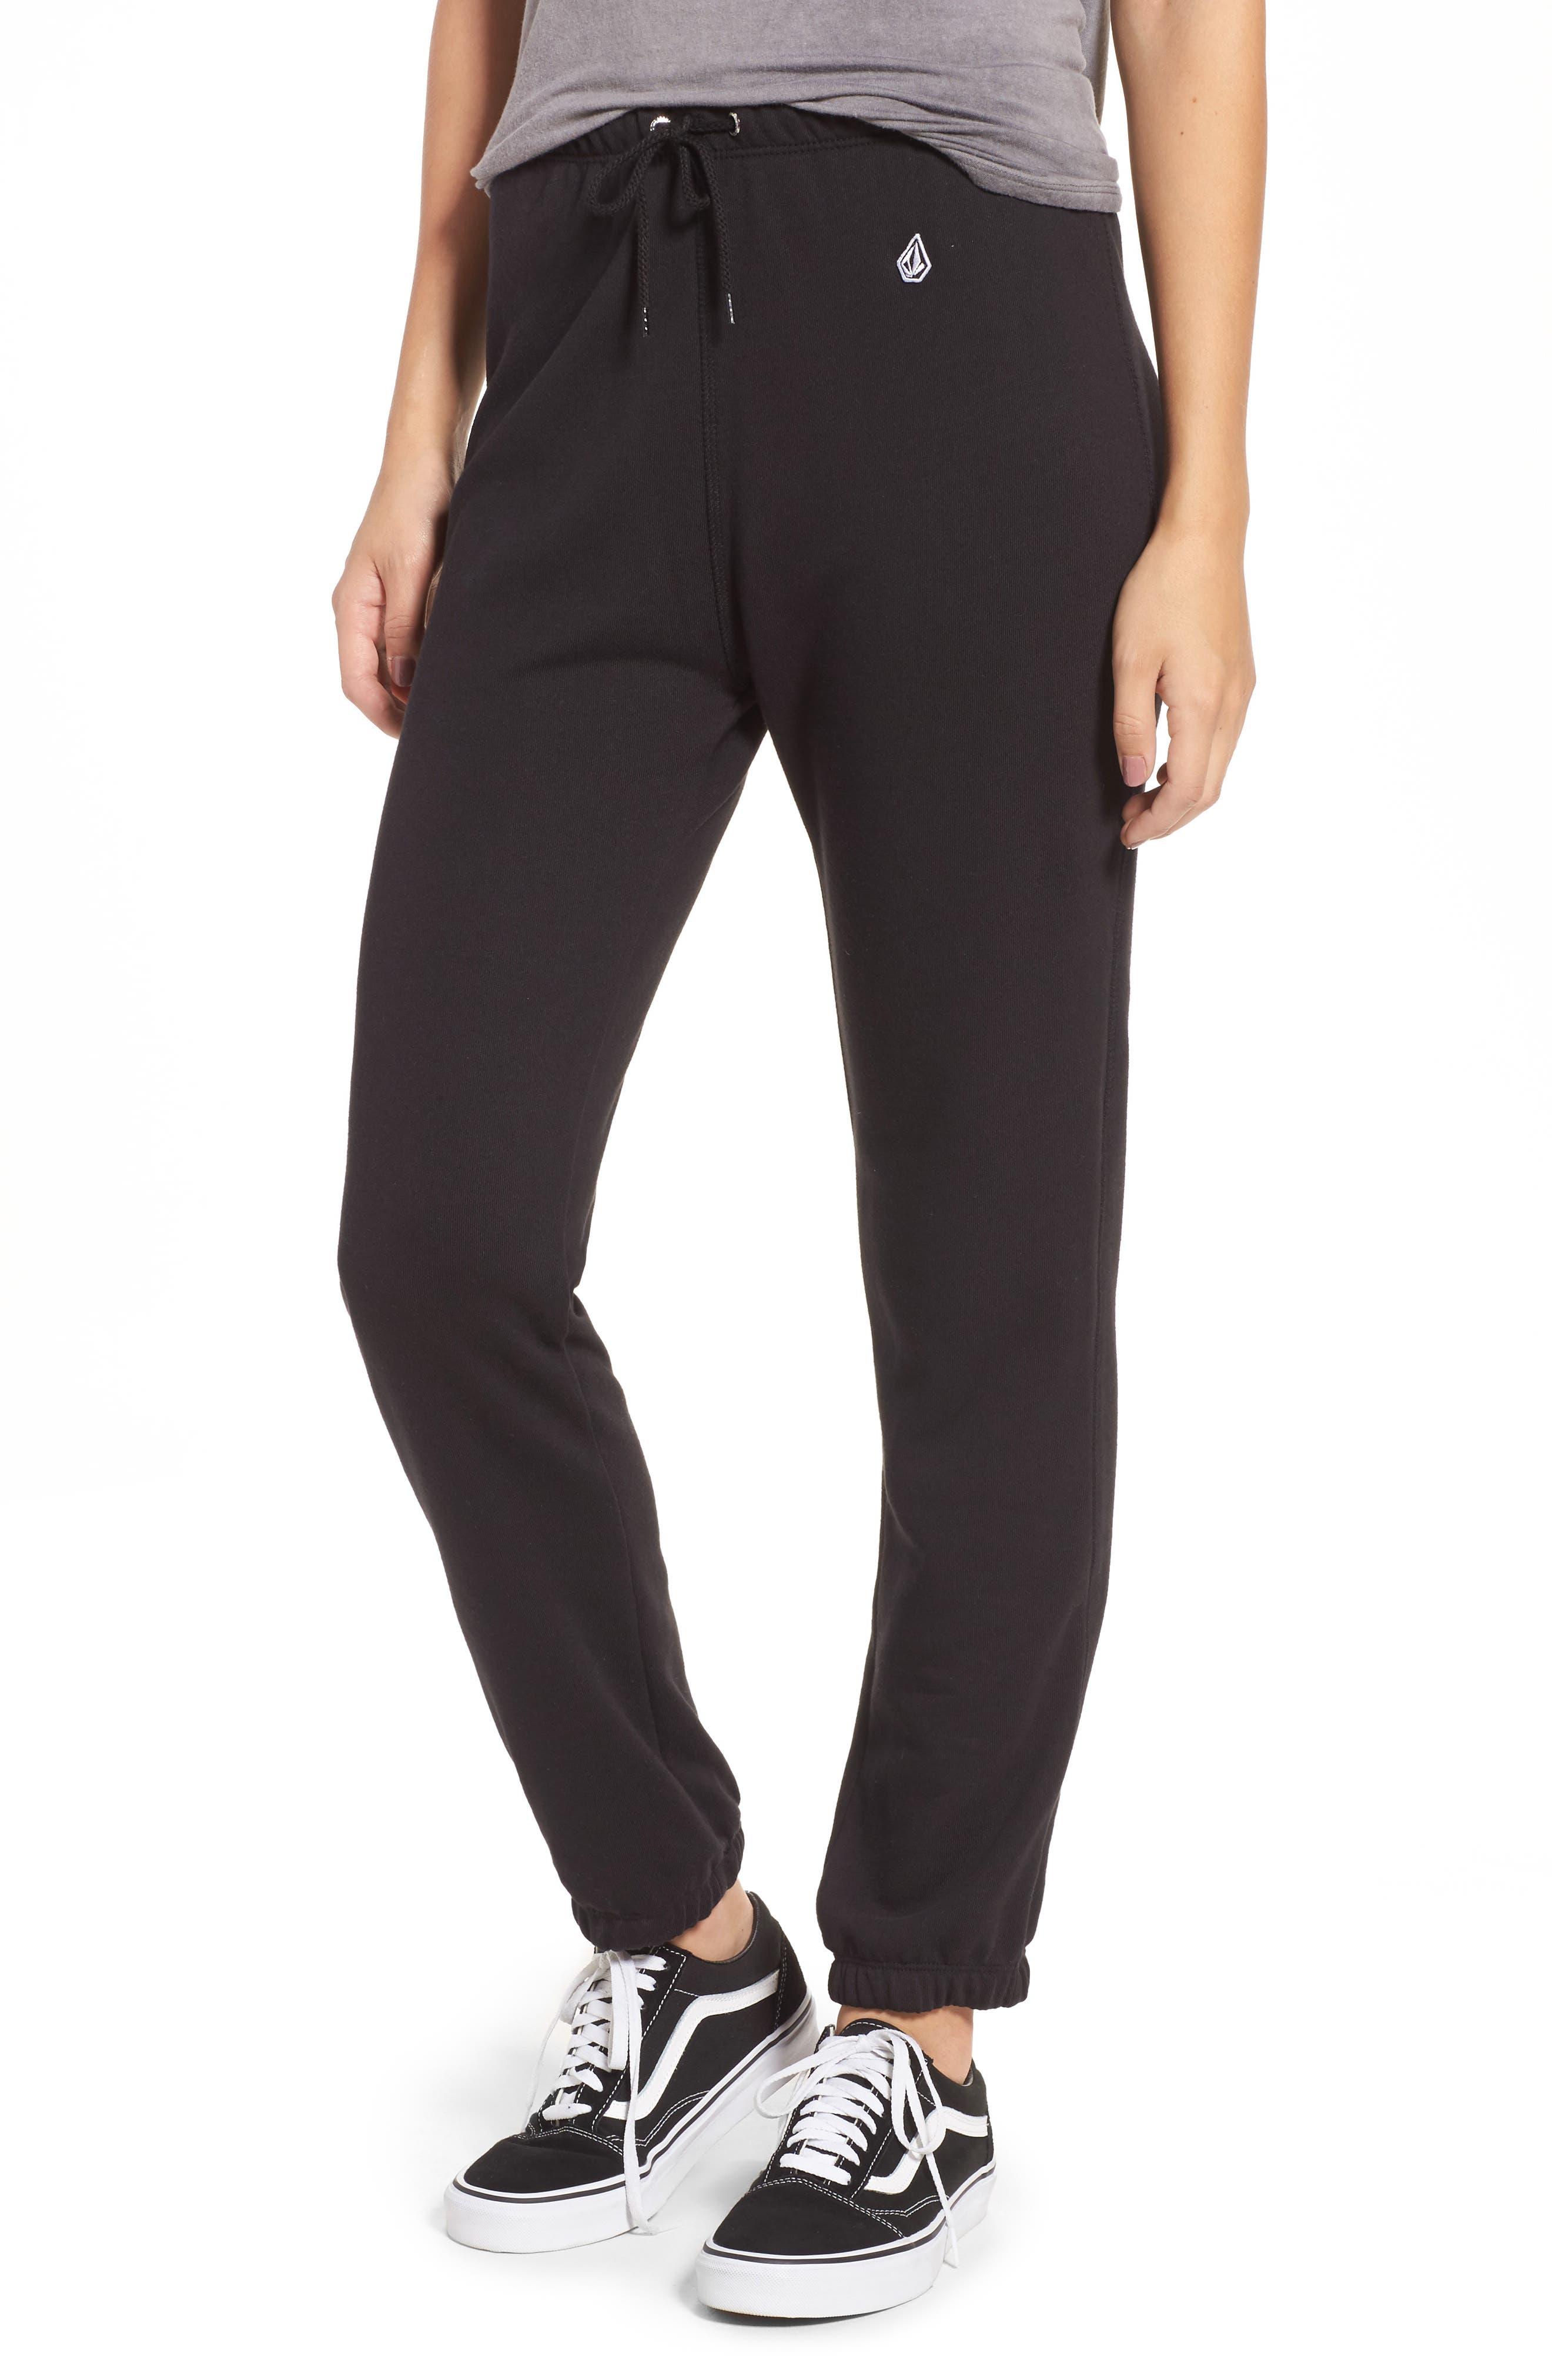 Vol Tower Sweatpants,                         Main,                         color, Black